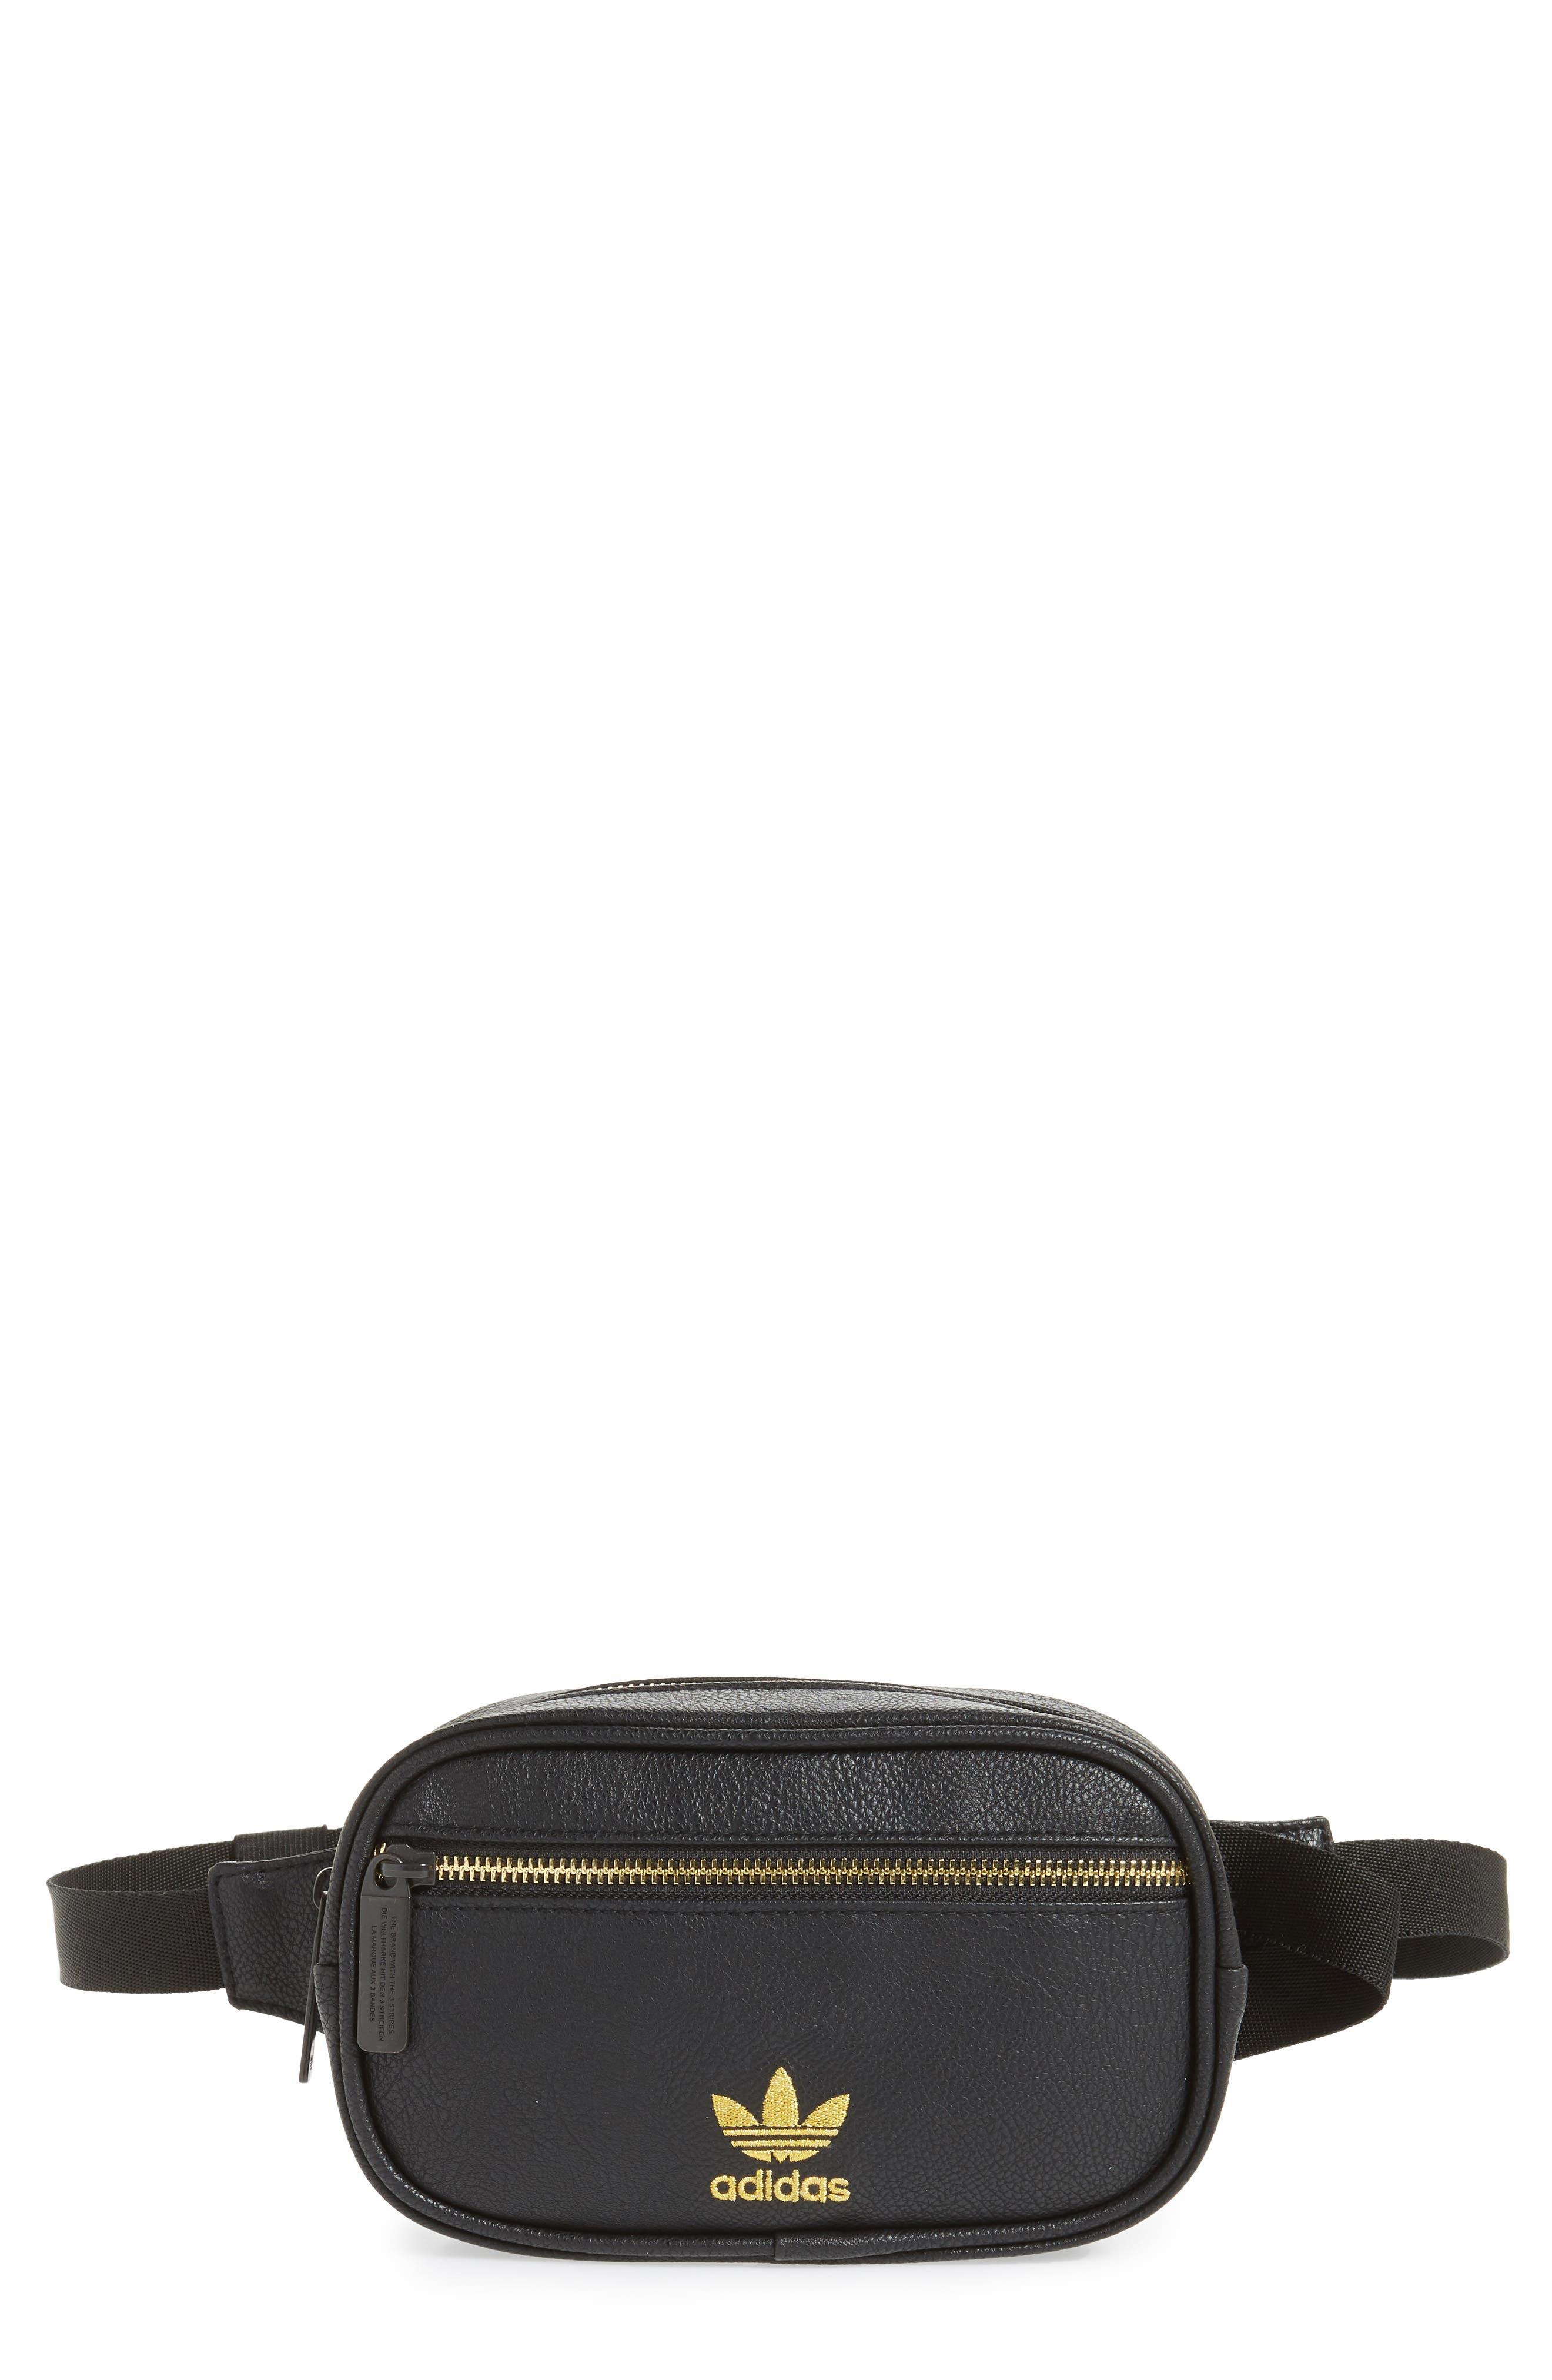 ADIDAS ORIGINALS adidas Ori Faux Leather Fanny Pack, Main, color, 001